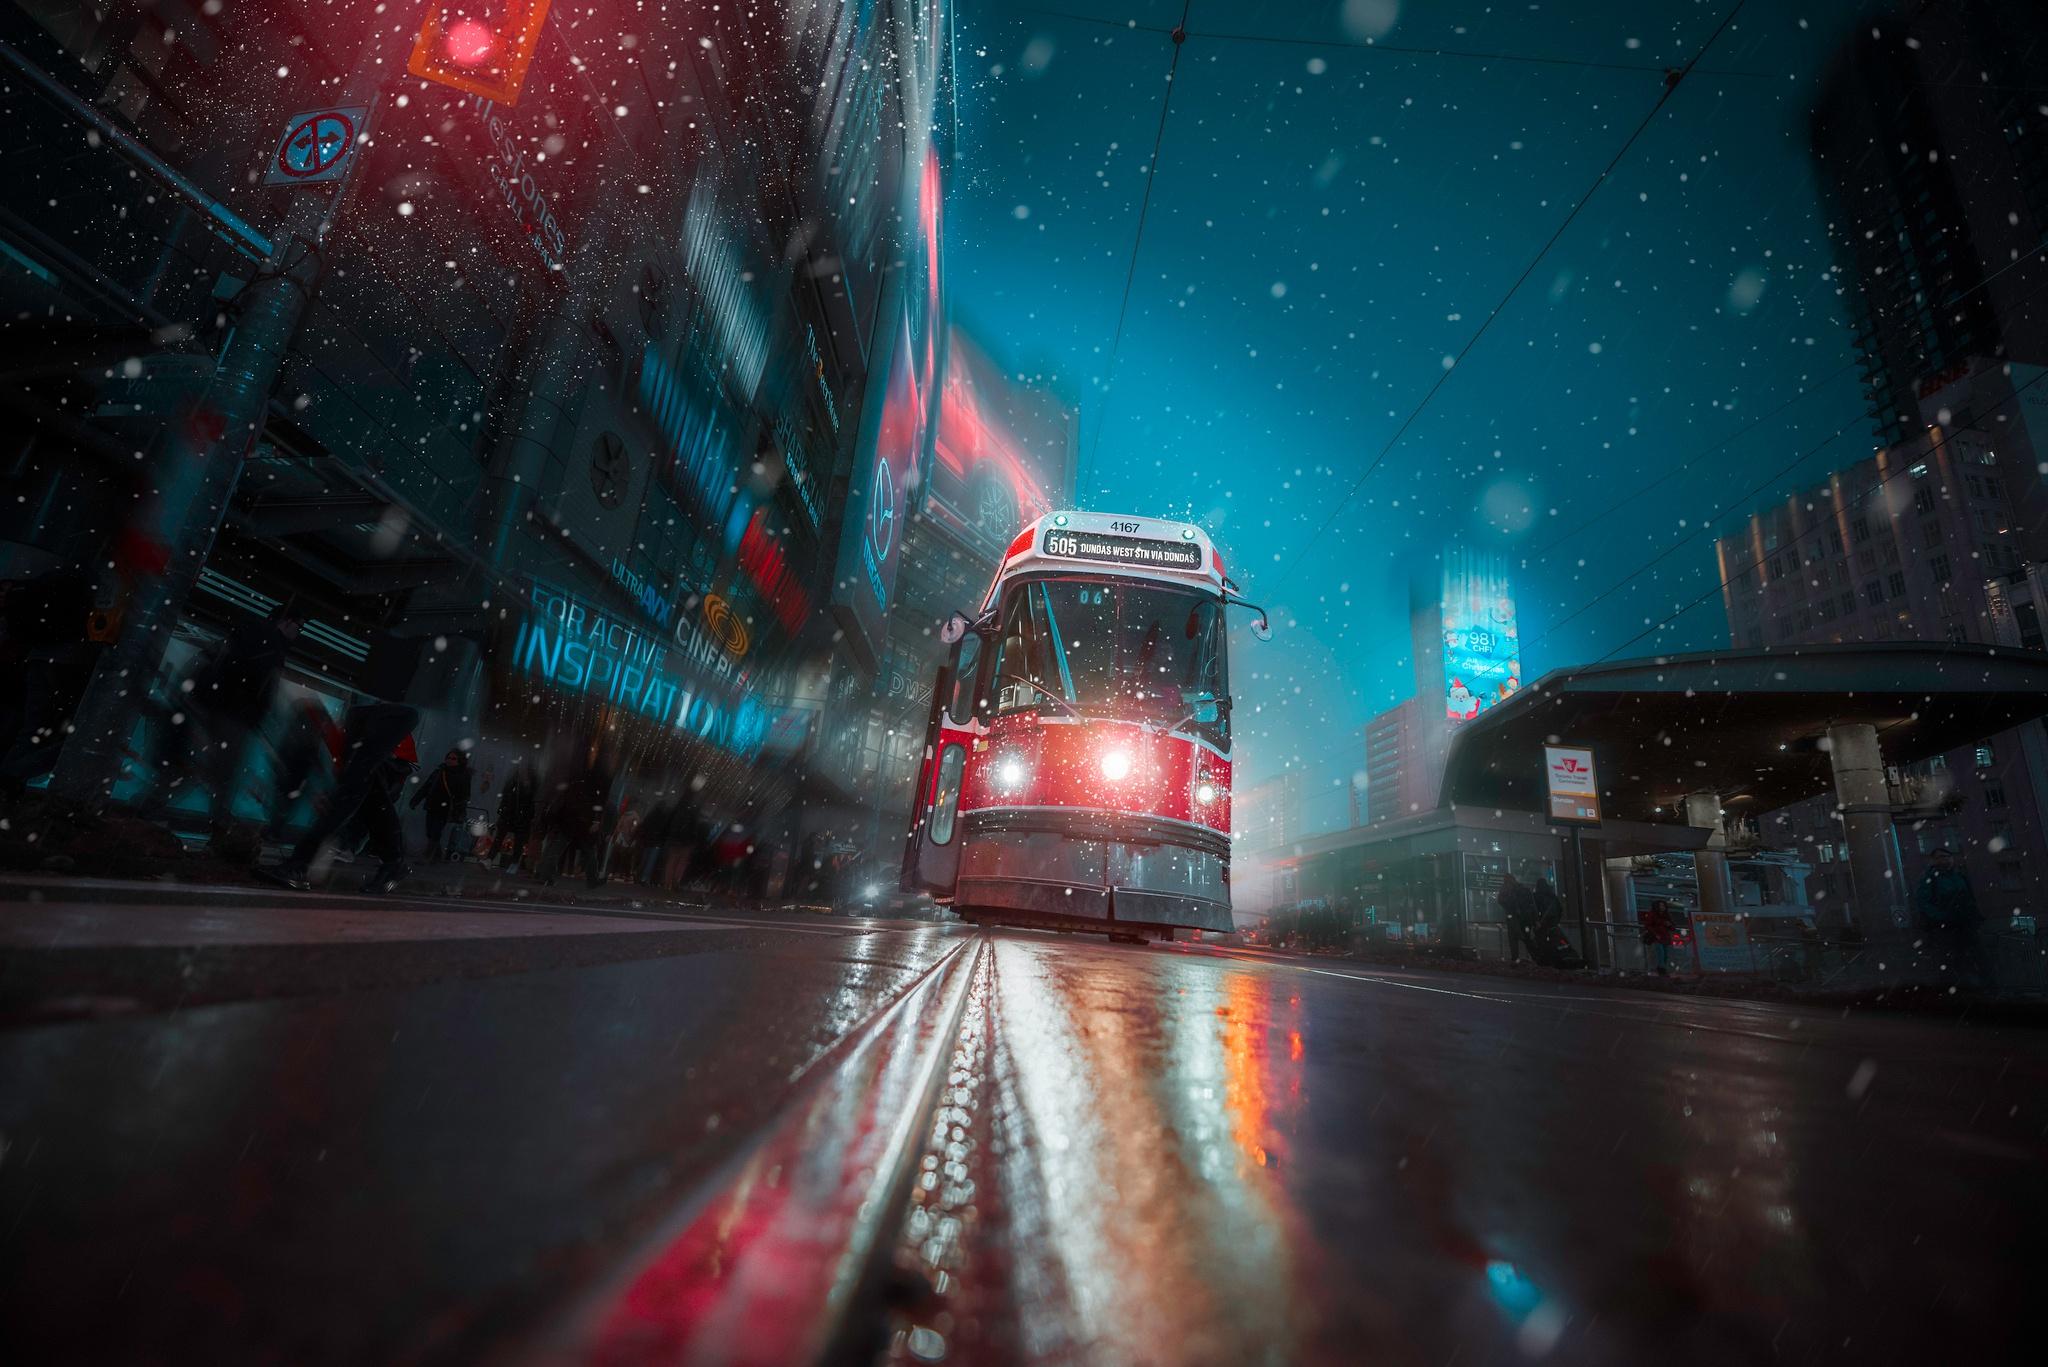 1125x2436 Toronto Tram Vehicle City Night Lights Iphone Xs